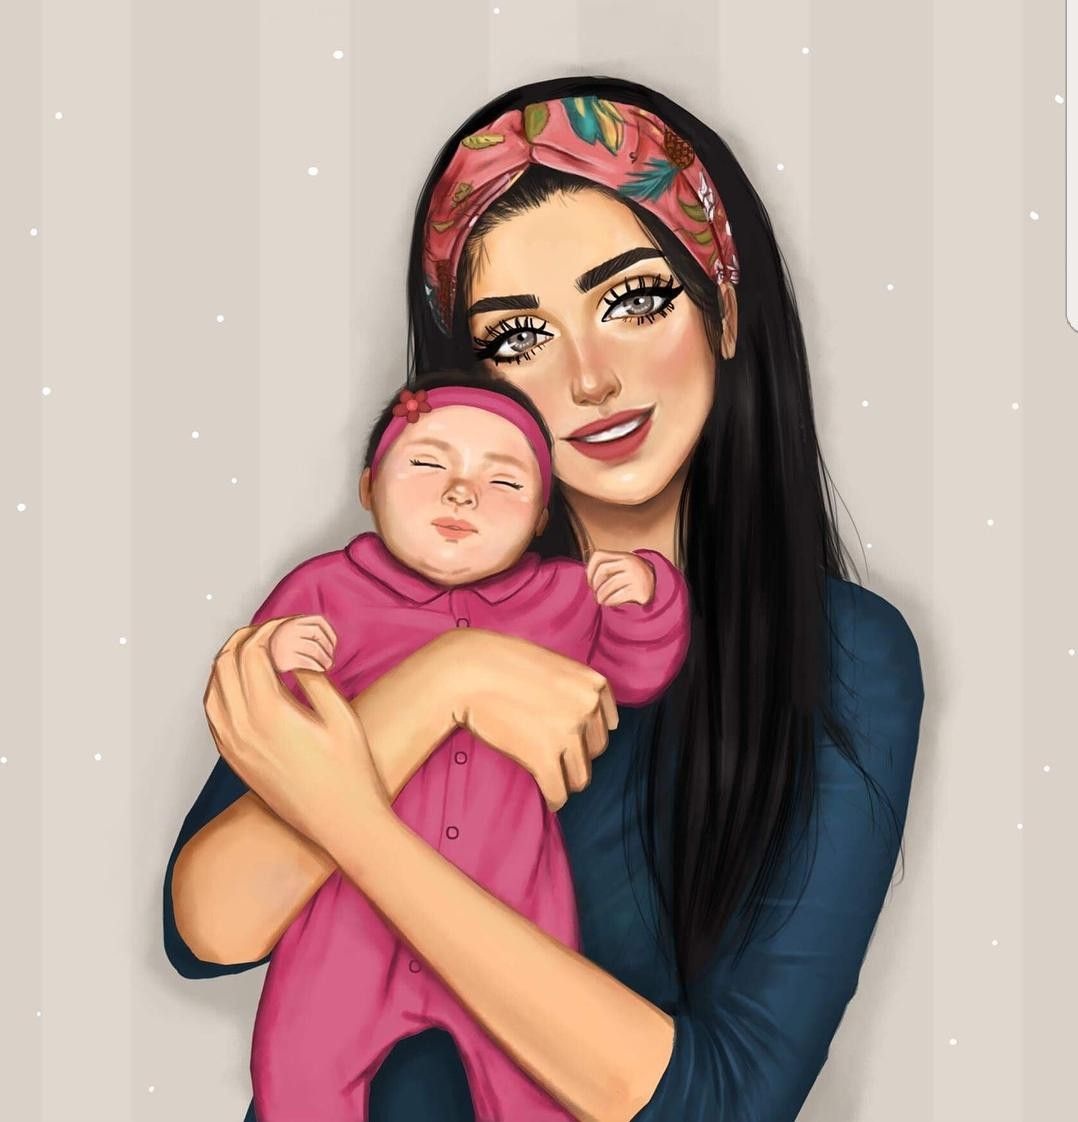 Pin By Skoubekeoduh On Drawing Mother Daughter Art Mom Art Sarra Art